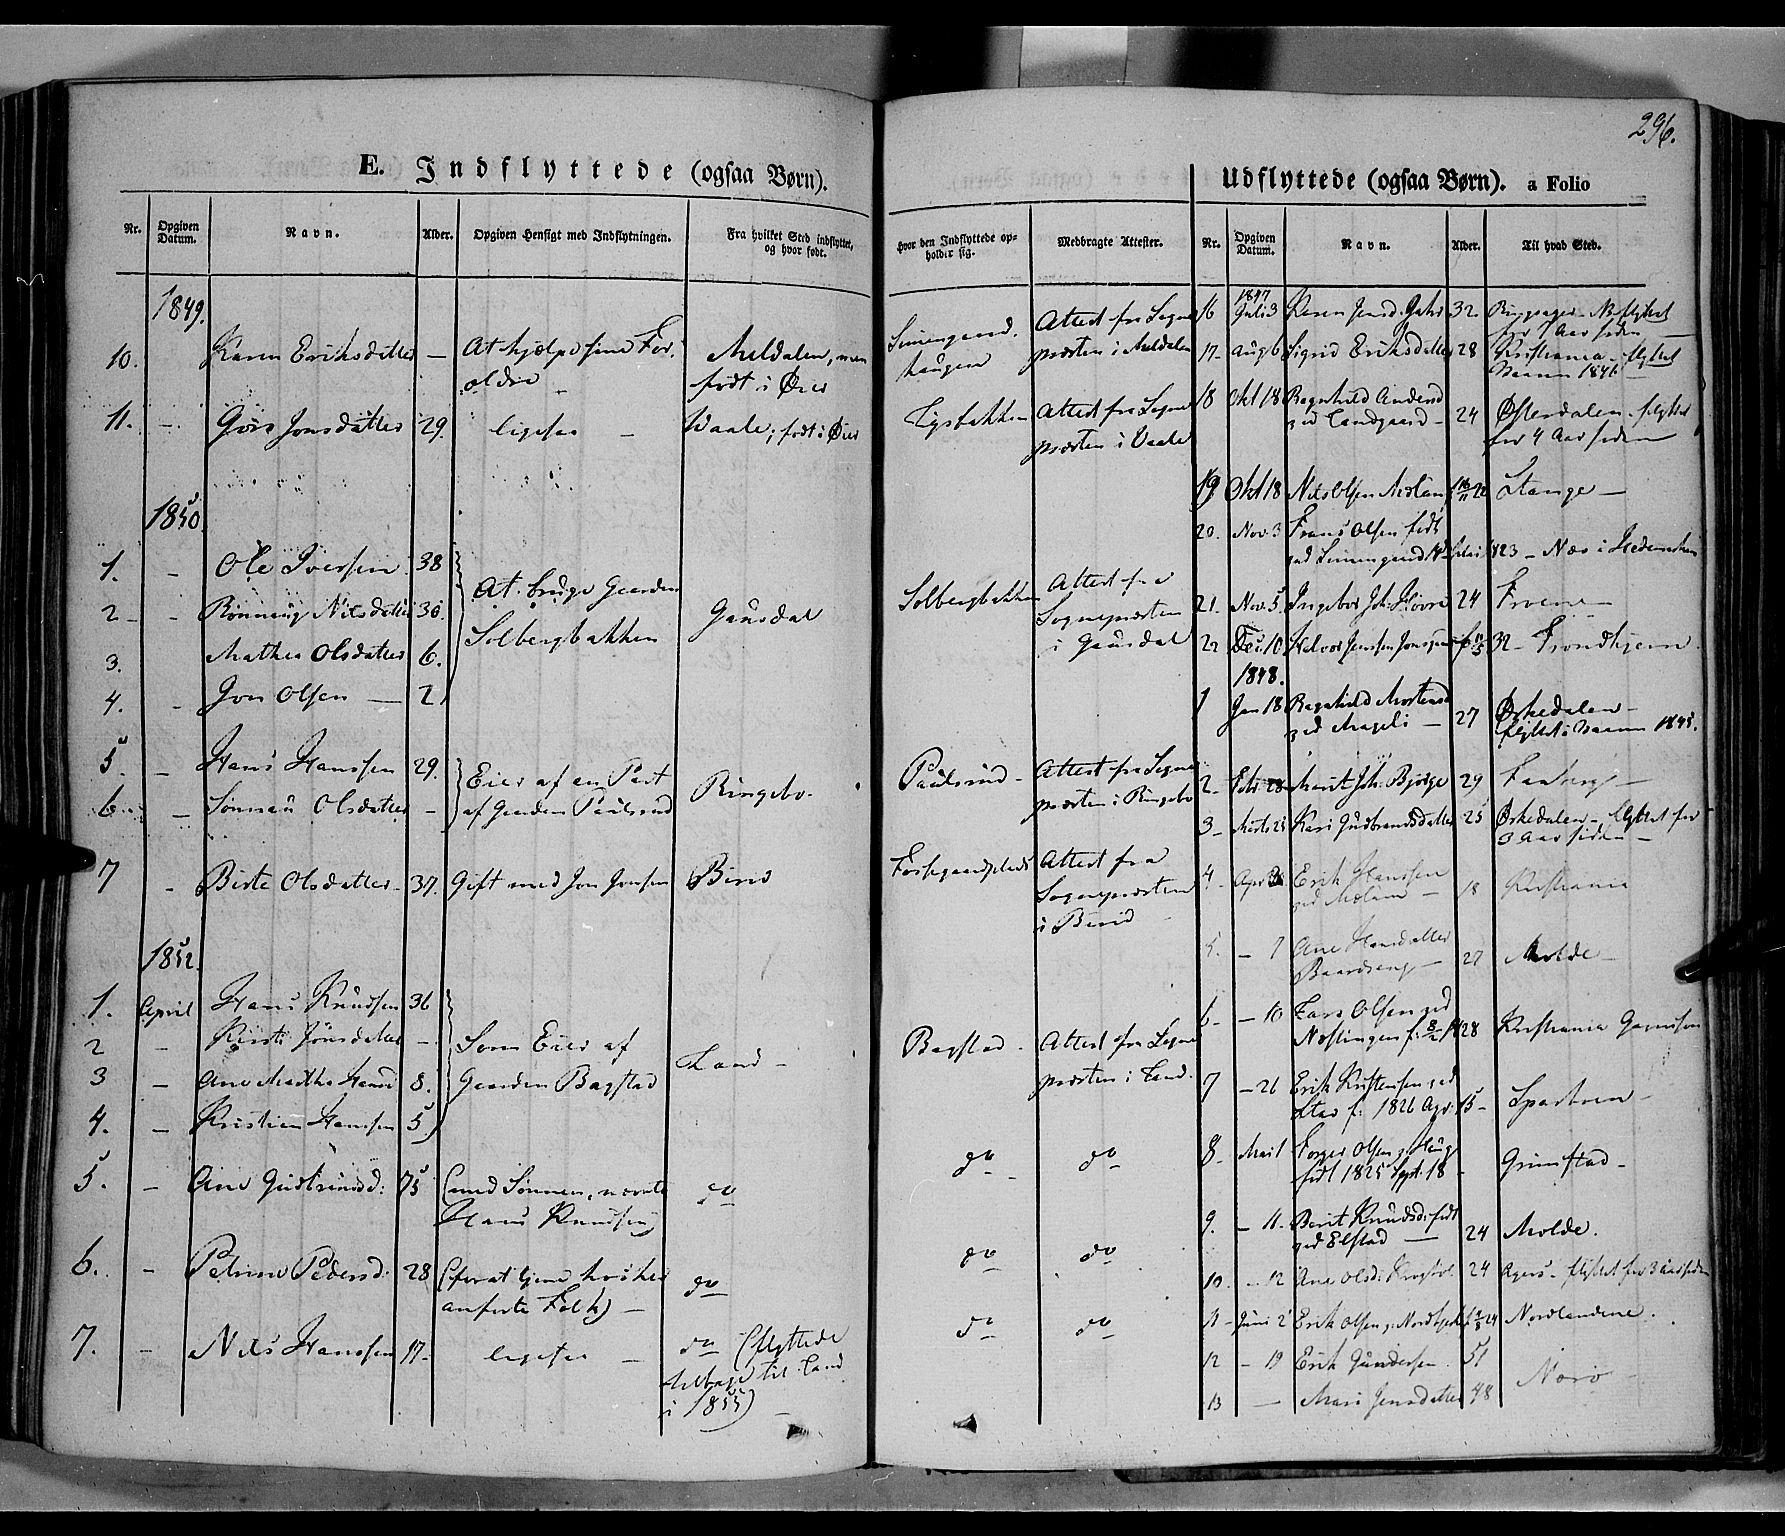 SAH, Øyer prestekontor, Ministerialbok nr. 5, 1842-1857, s. 296